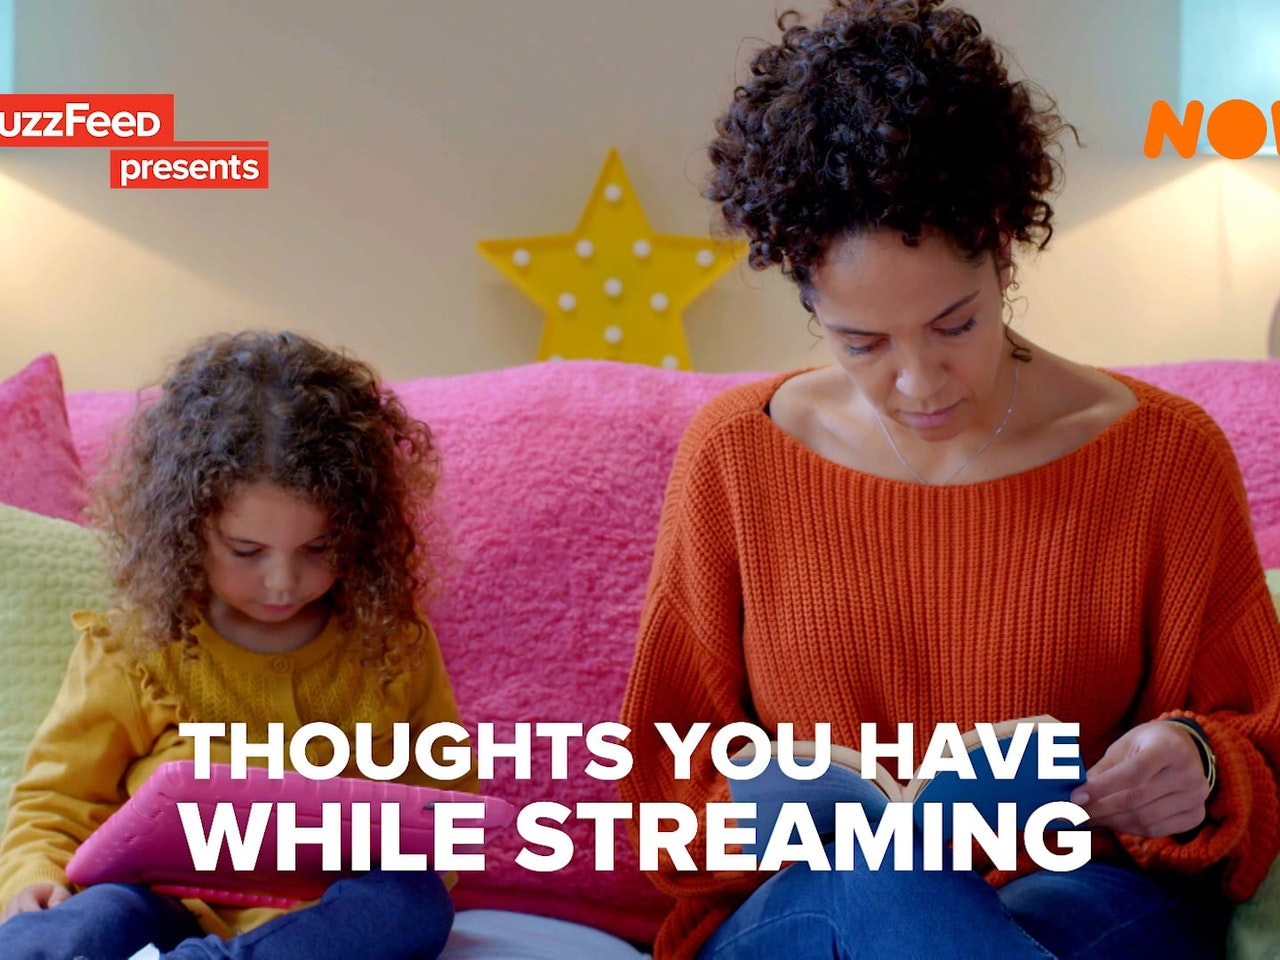 BuzzFeed x NOW TV - When Kids TV Songs Get Stuck In Your Head